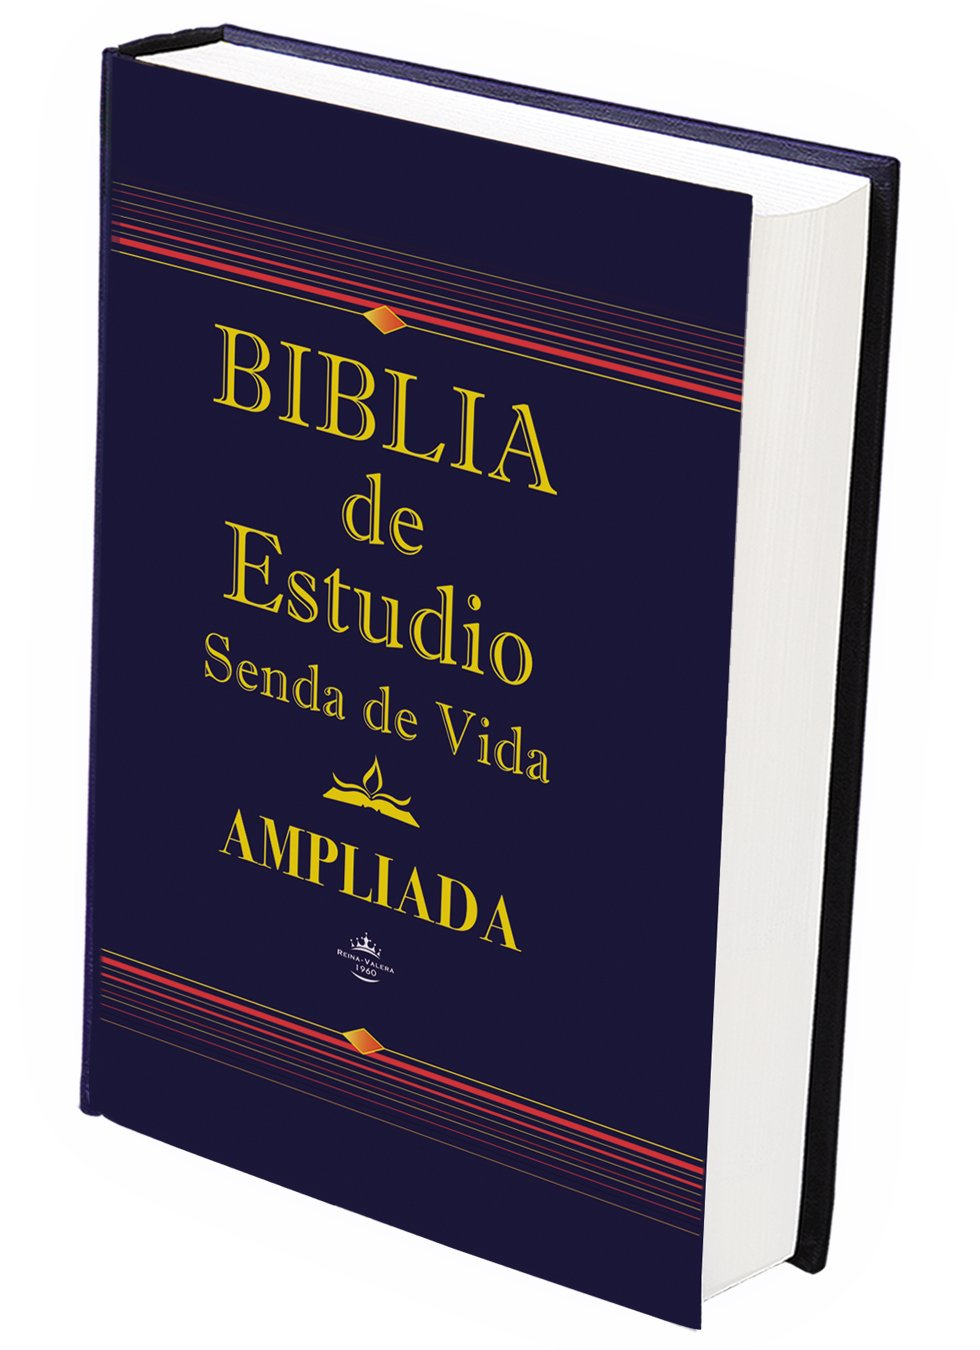 Biblia de Estudio Ampliada Tapa Dura con Indice: Senda de Vida Publishers:  9781622152117: Amazon.com: Books